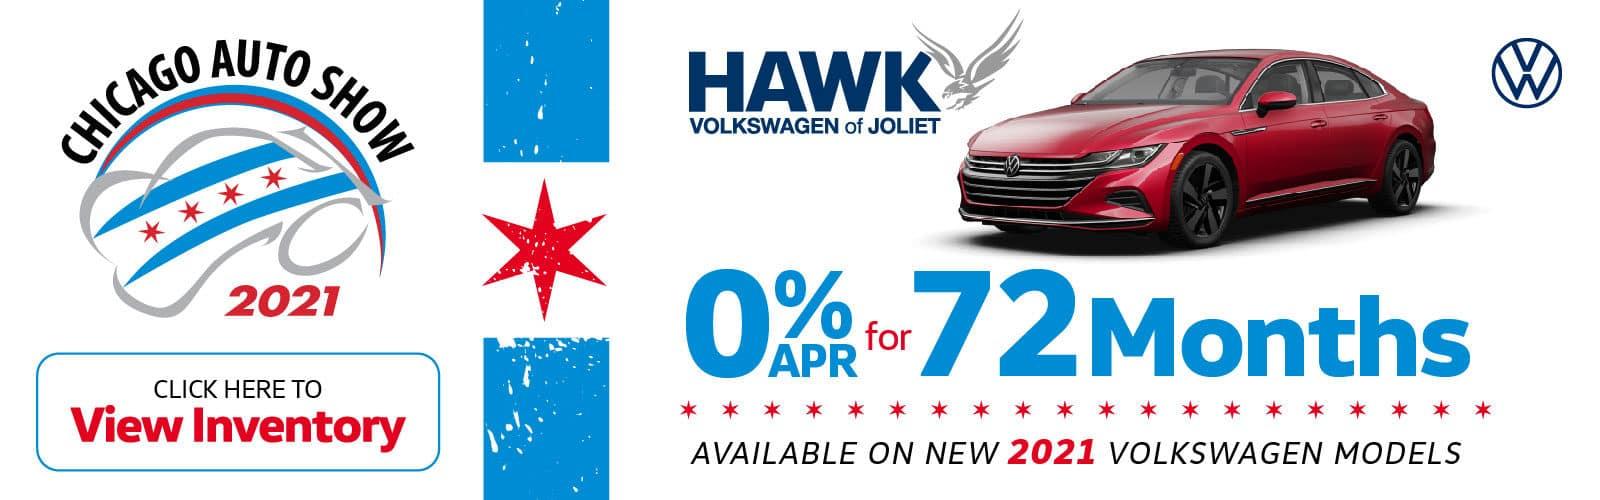 HVWJ070621hero-autoshow-1600x500_incentives